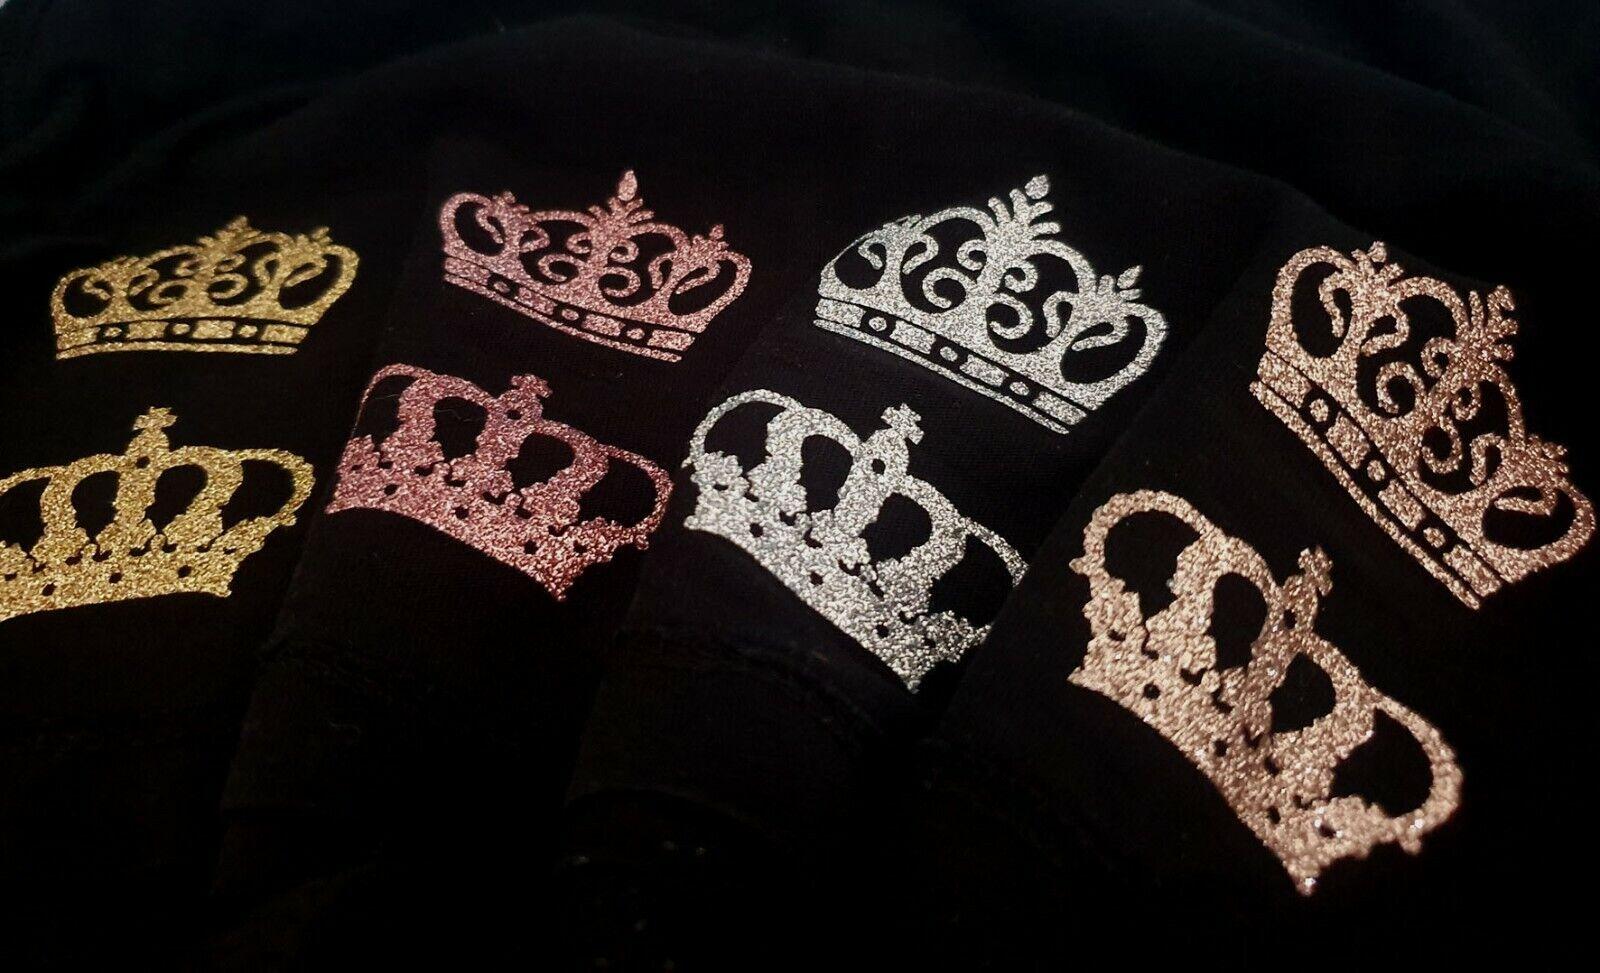 fabric glitter crown iron-on hotfix fancy costume tshirt transfer applique patch